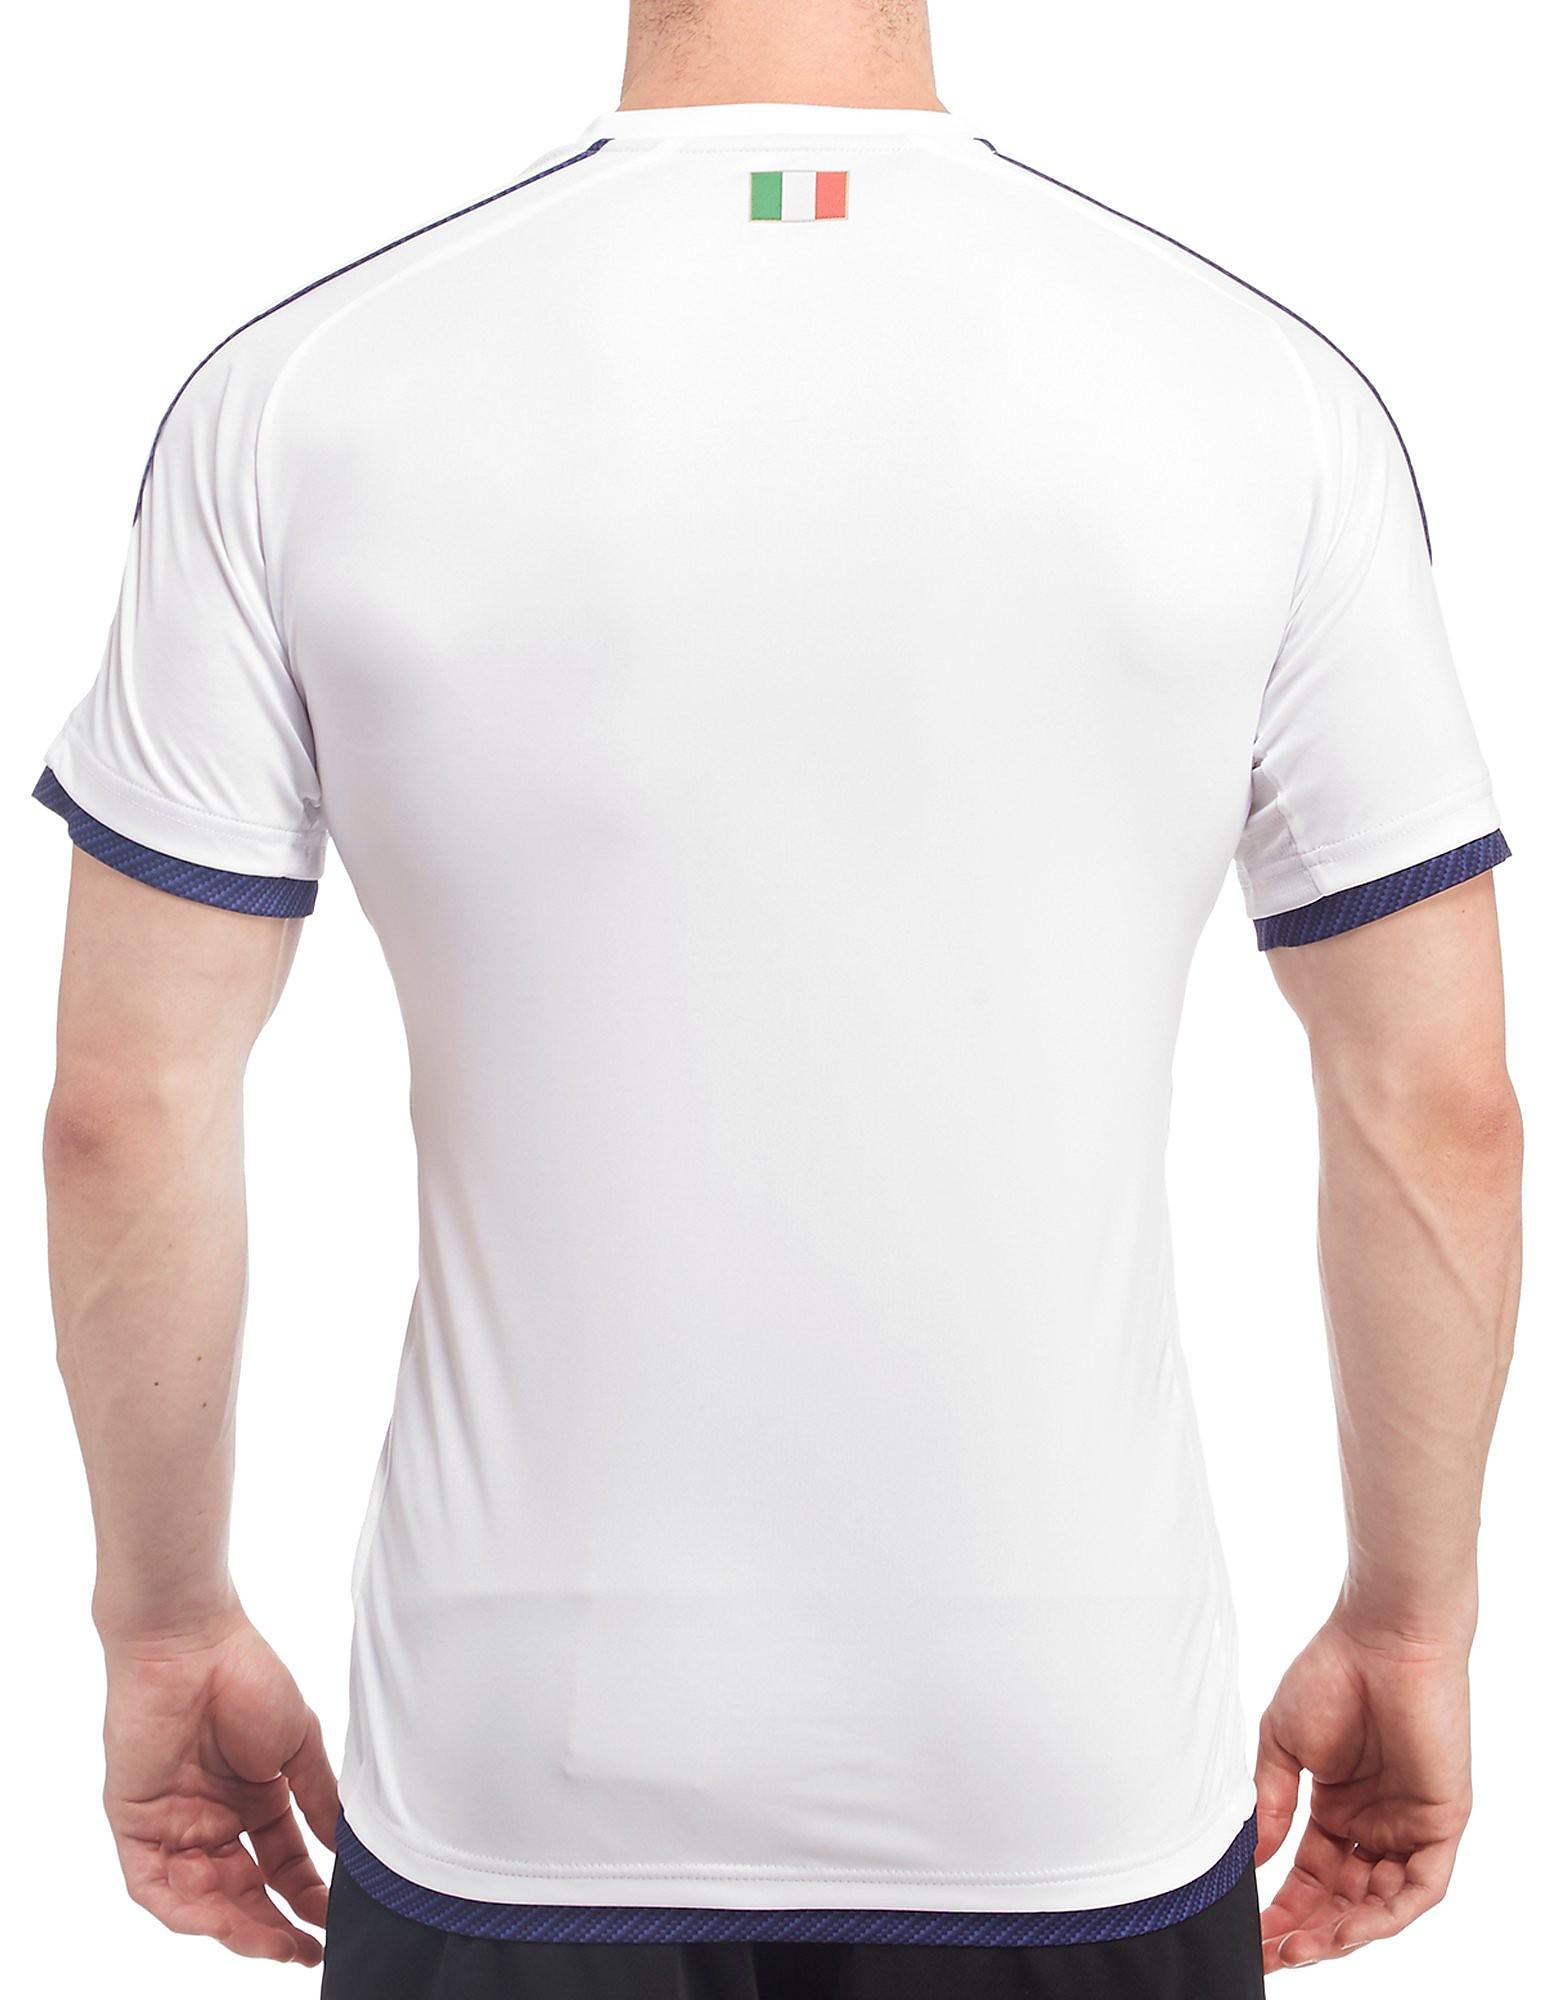 PUMA Italy 2016/17 Away Shirt